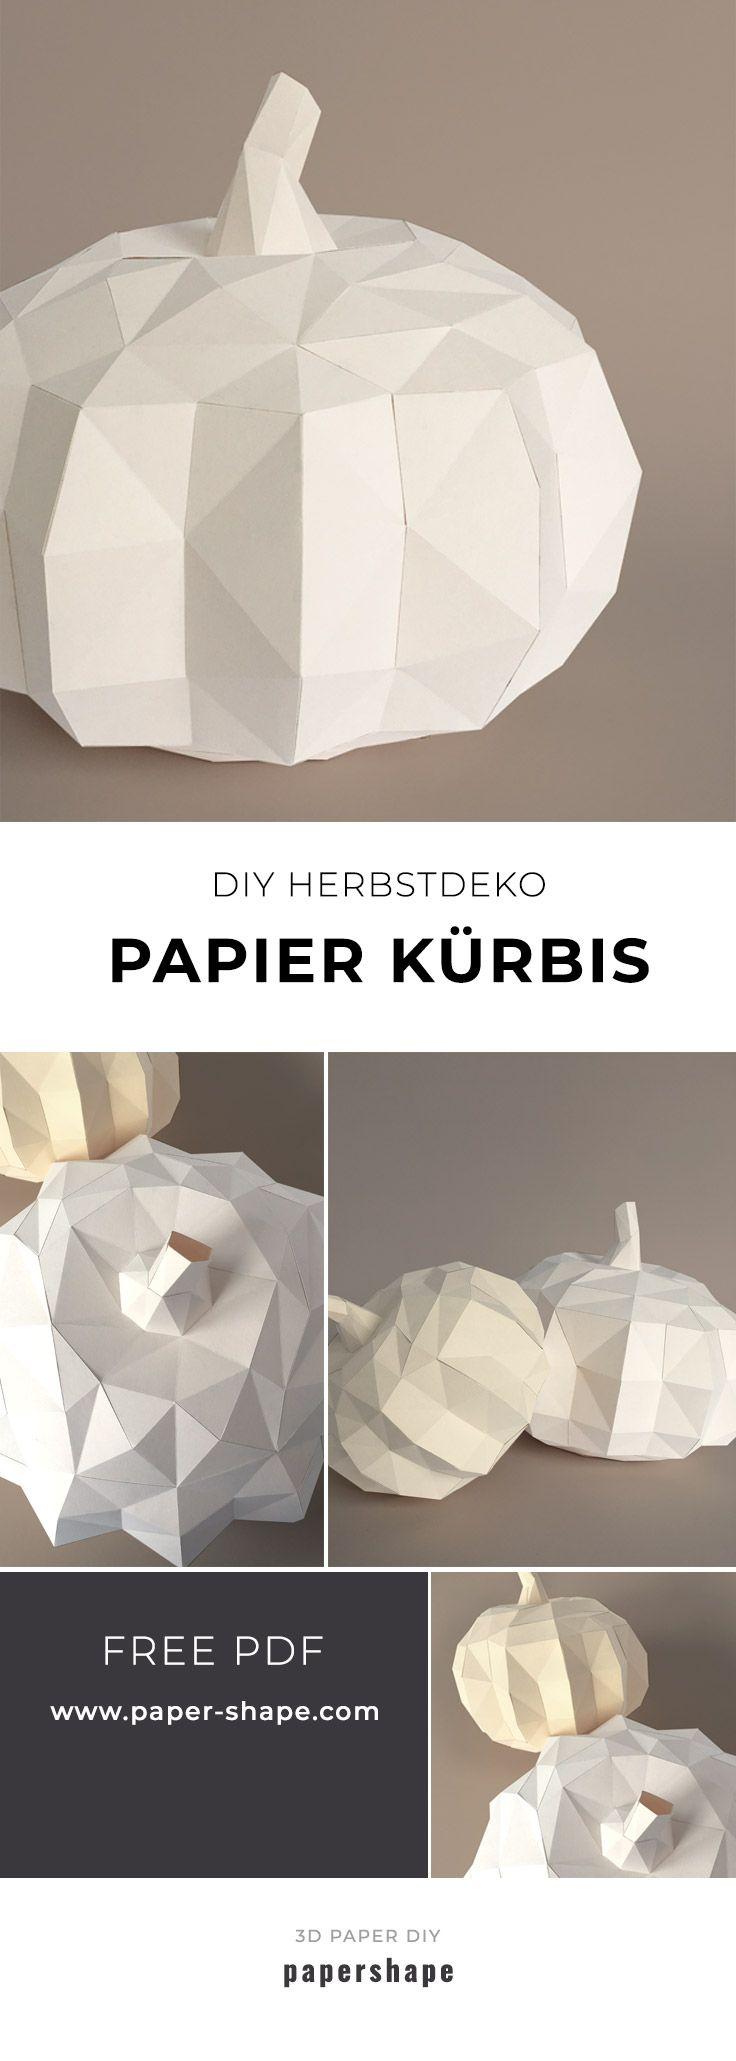 Moderner DIY Kürbis aus Papier basteln